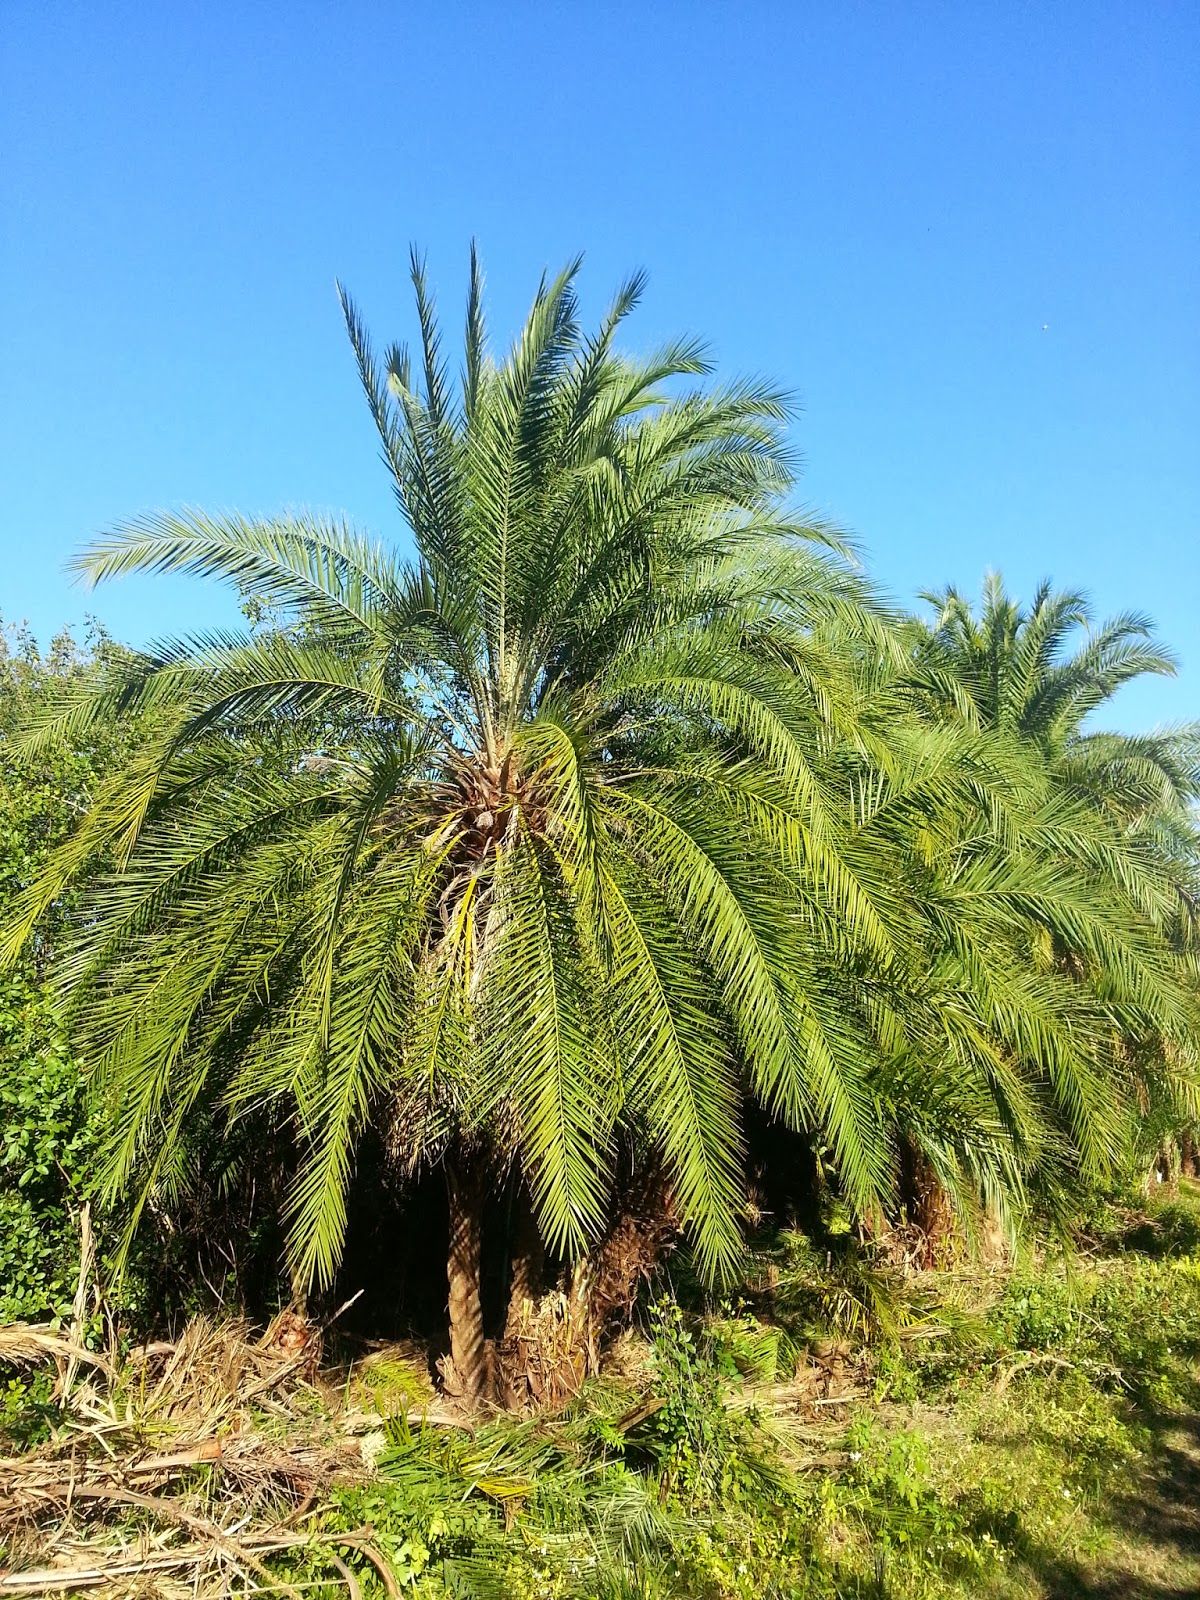 A Quality Plant 1 26 14 2